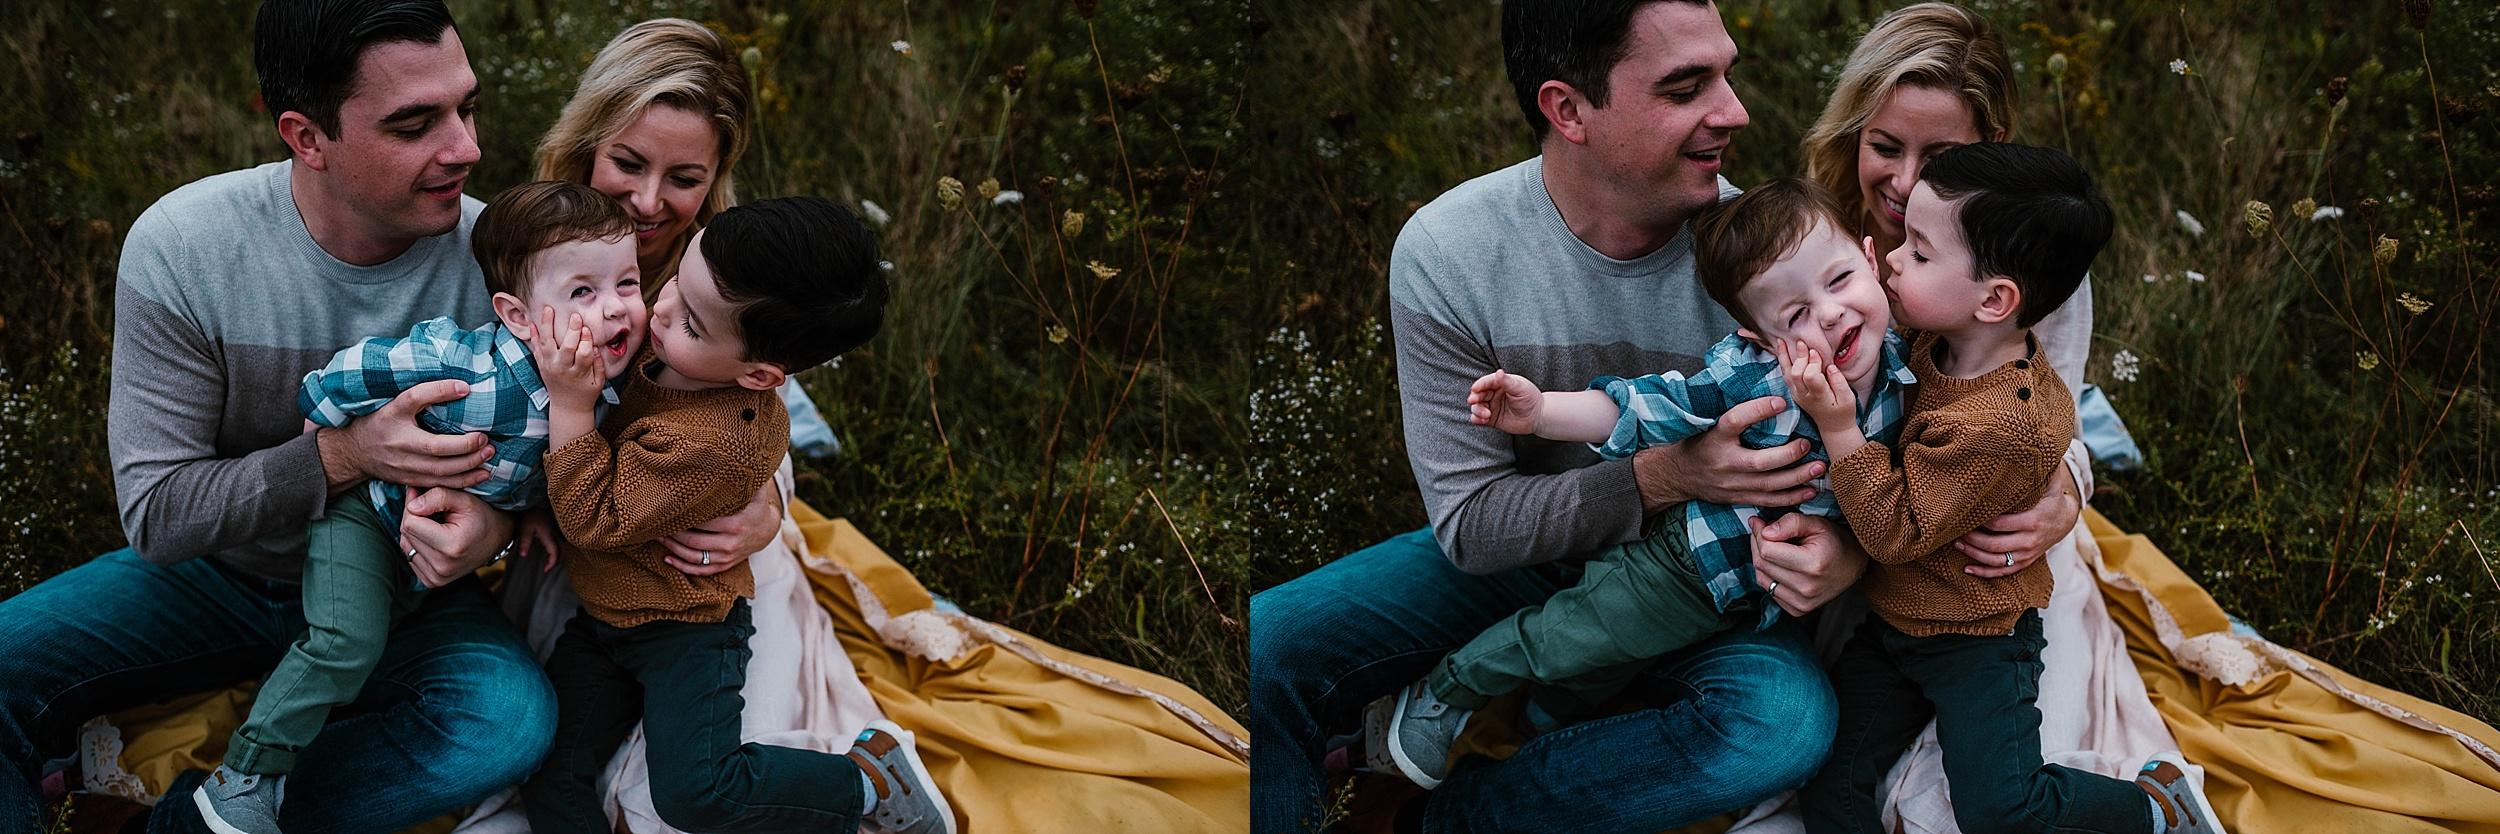 lauren-grayson-photography-portrait-artist-akron-cleveland-ohio-photographer-family-session-fields-sunset-fall_0186.jpg